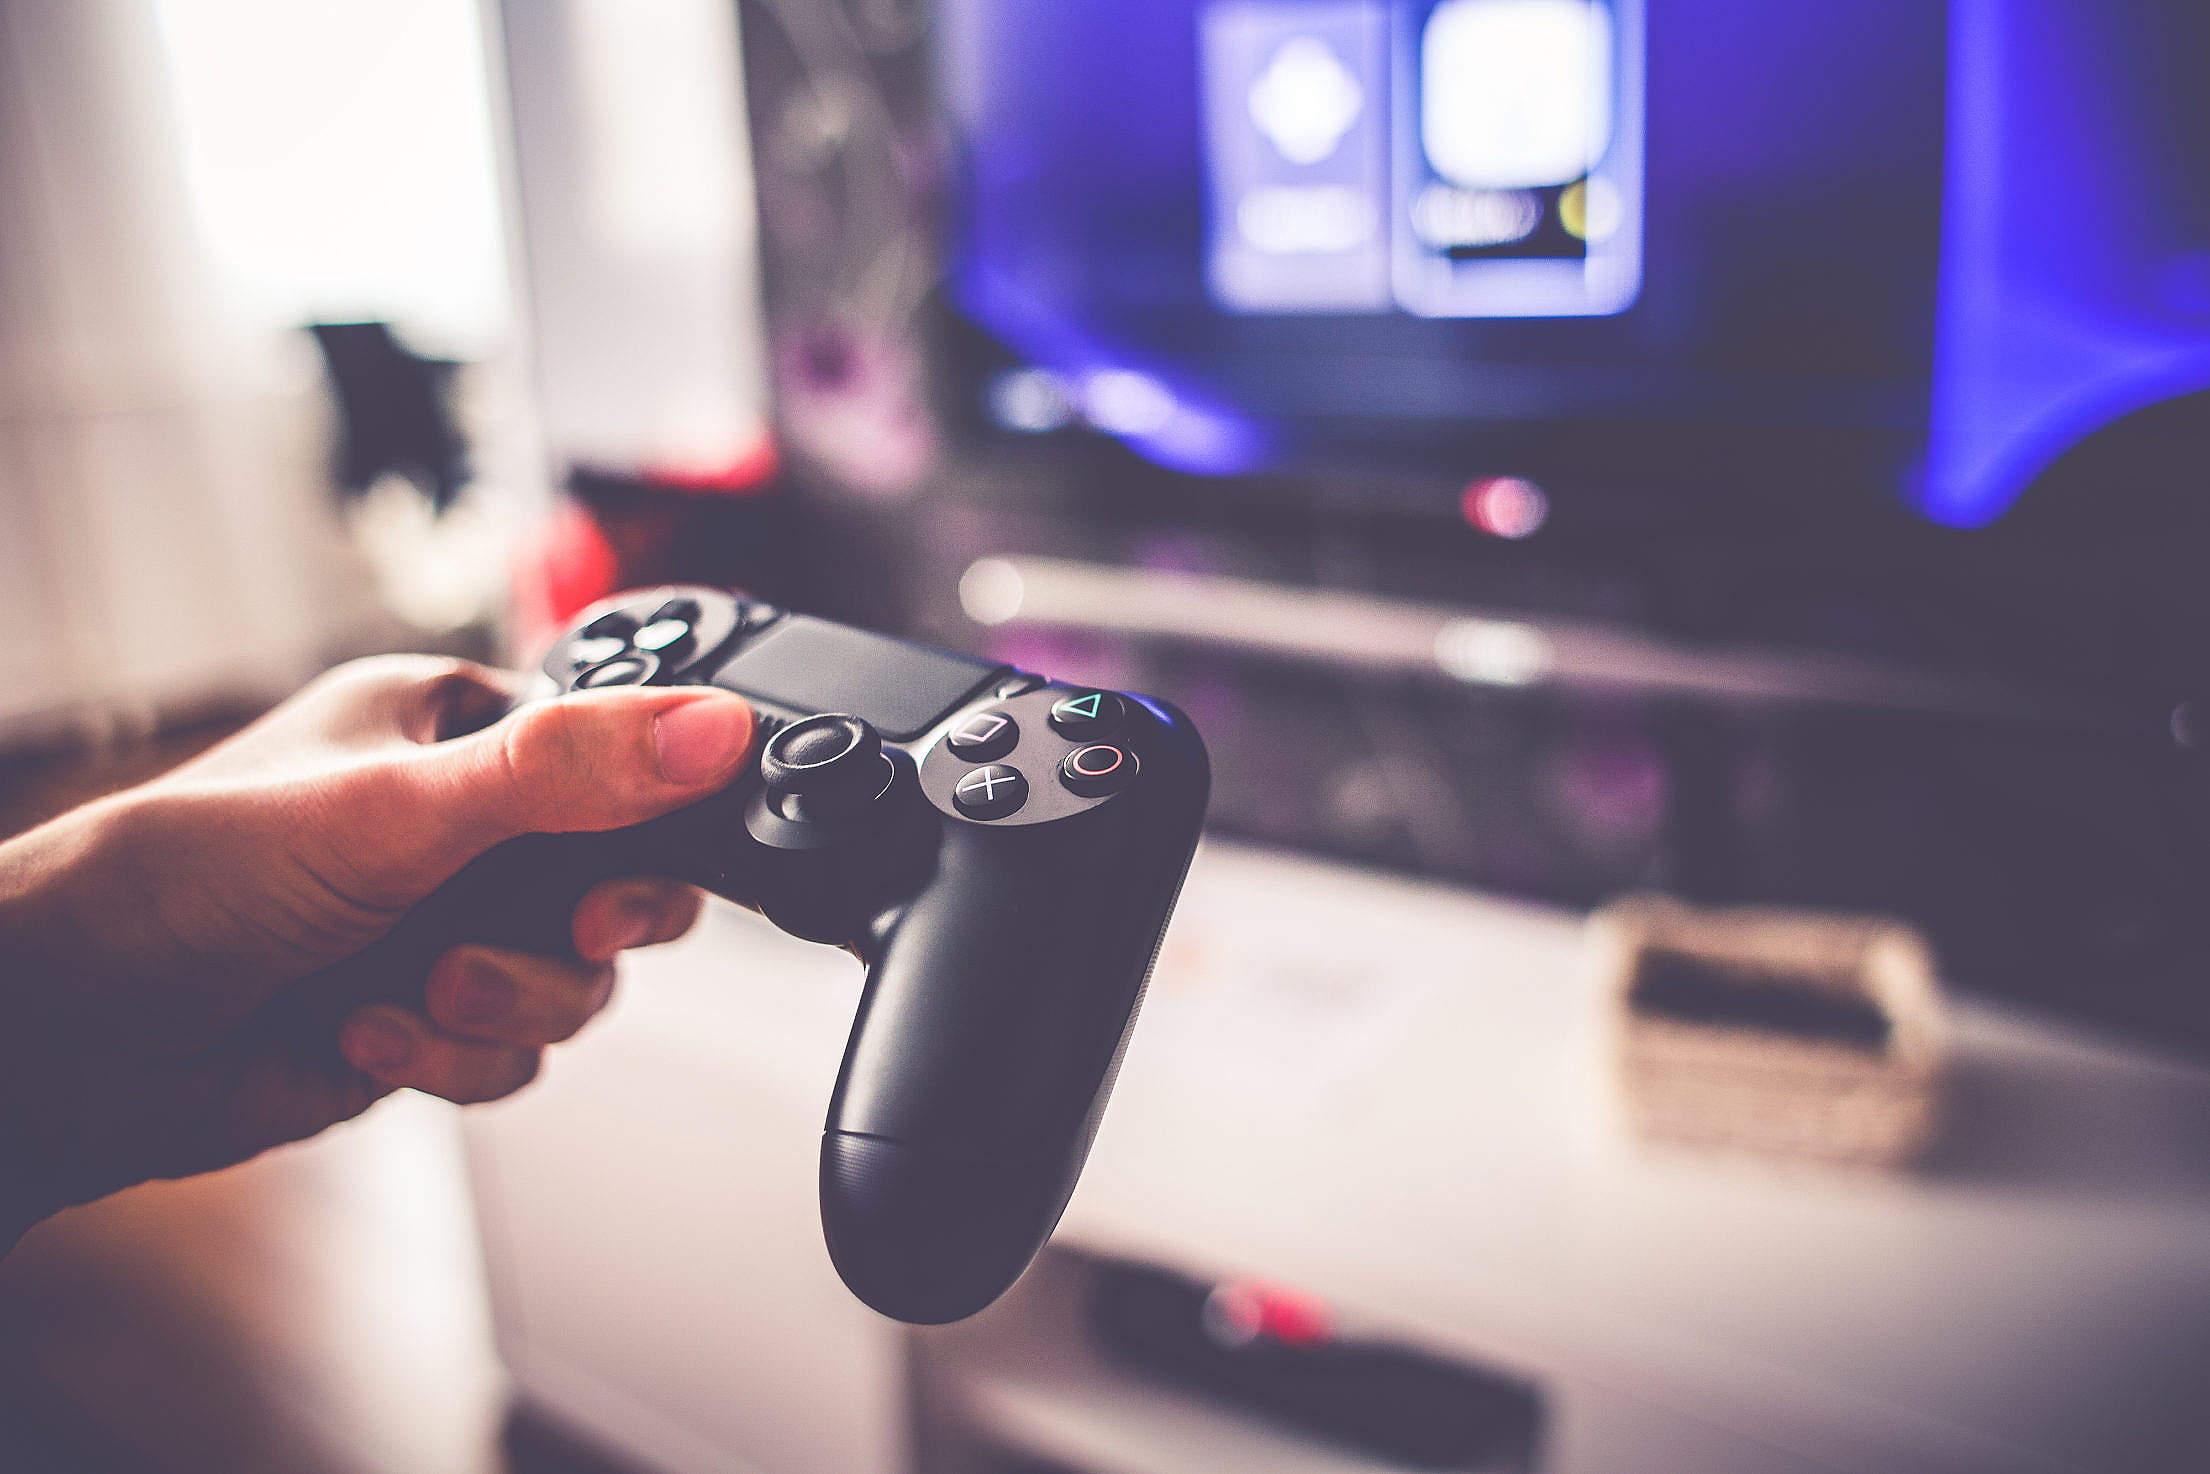 Playing game photo